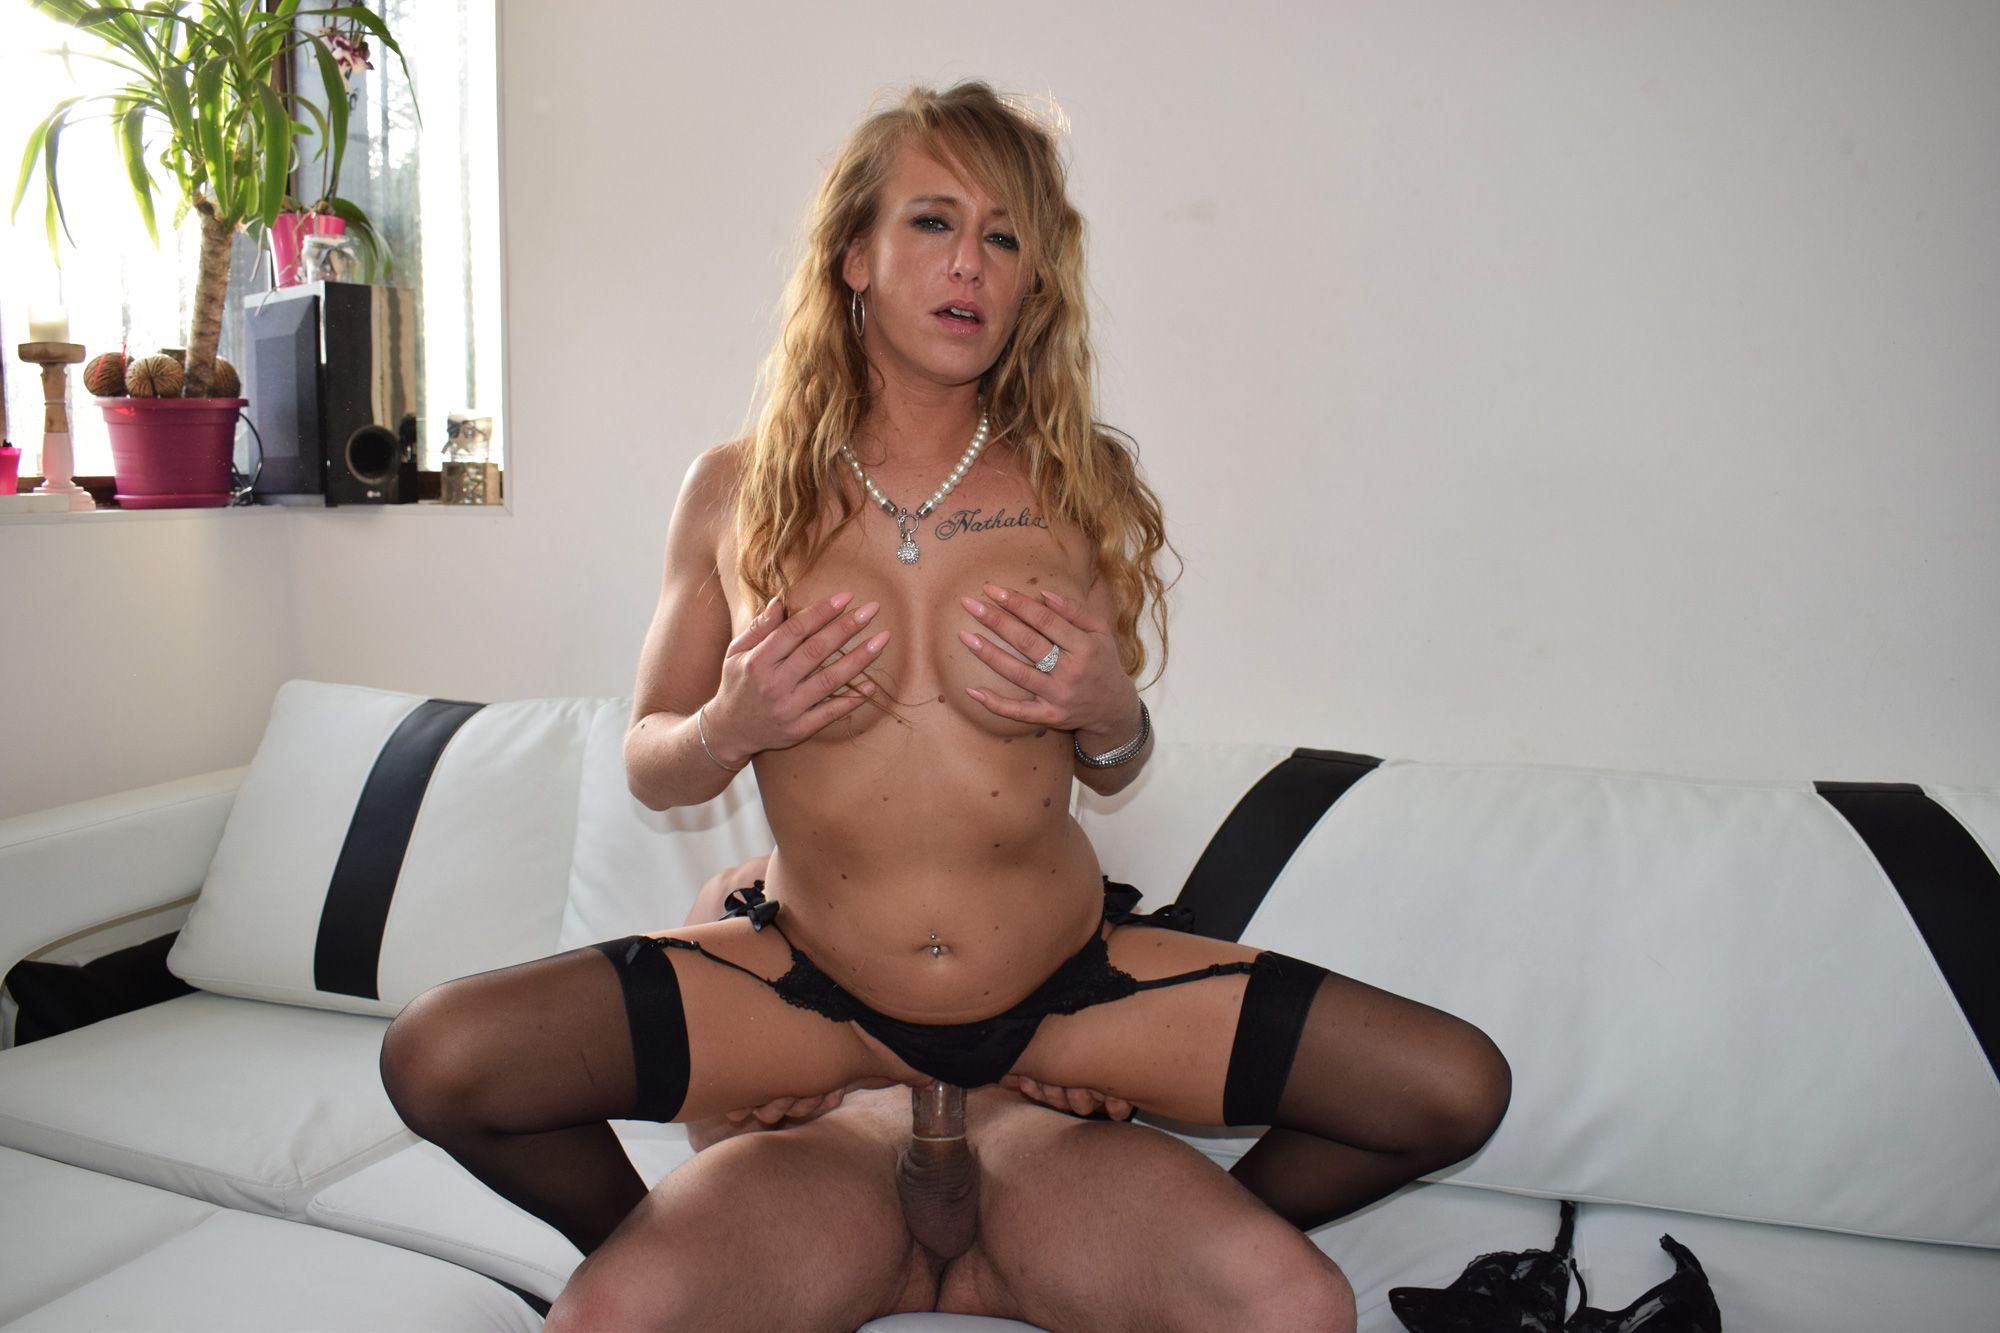 150-french-porn-star-8-scene-n-1